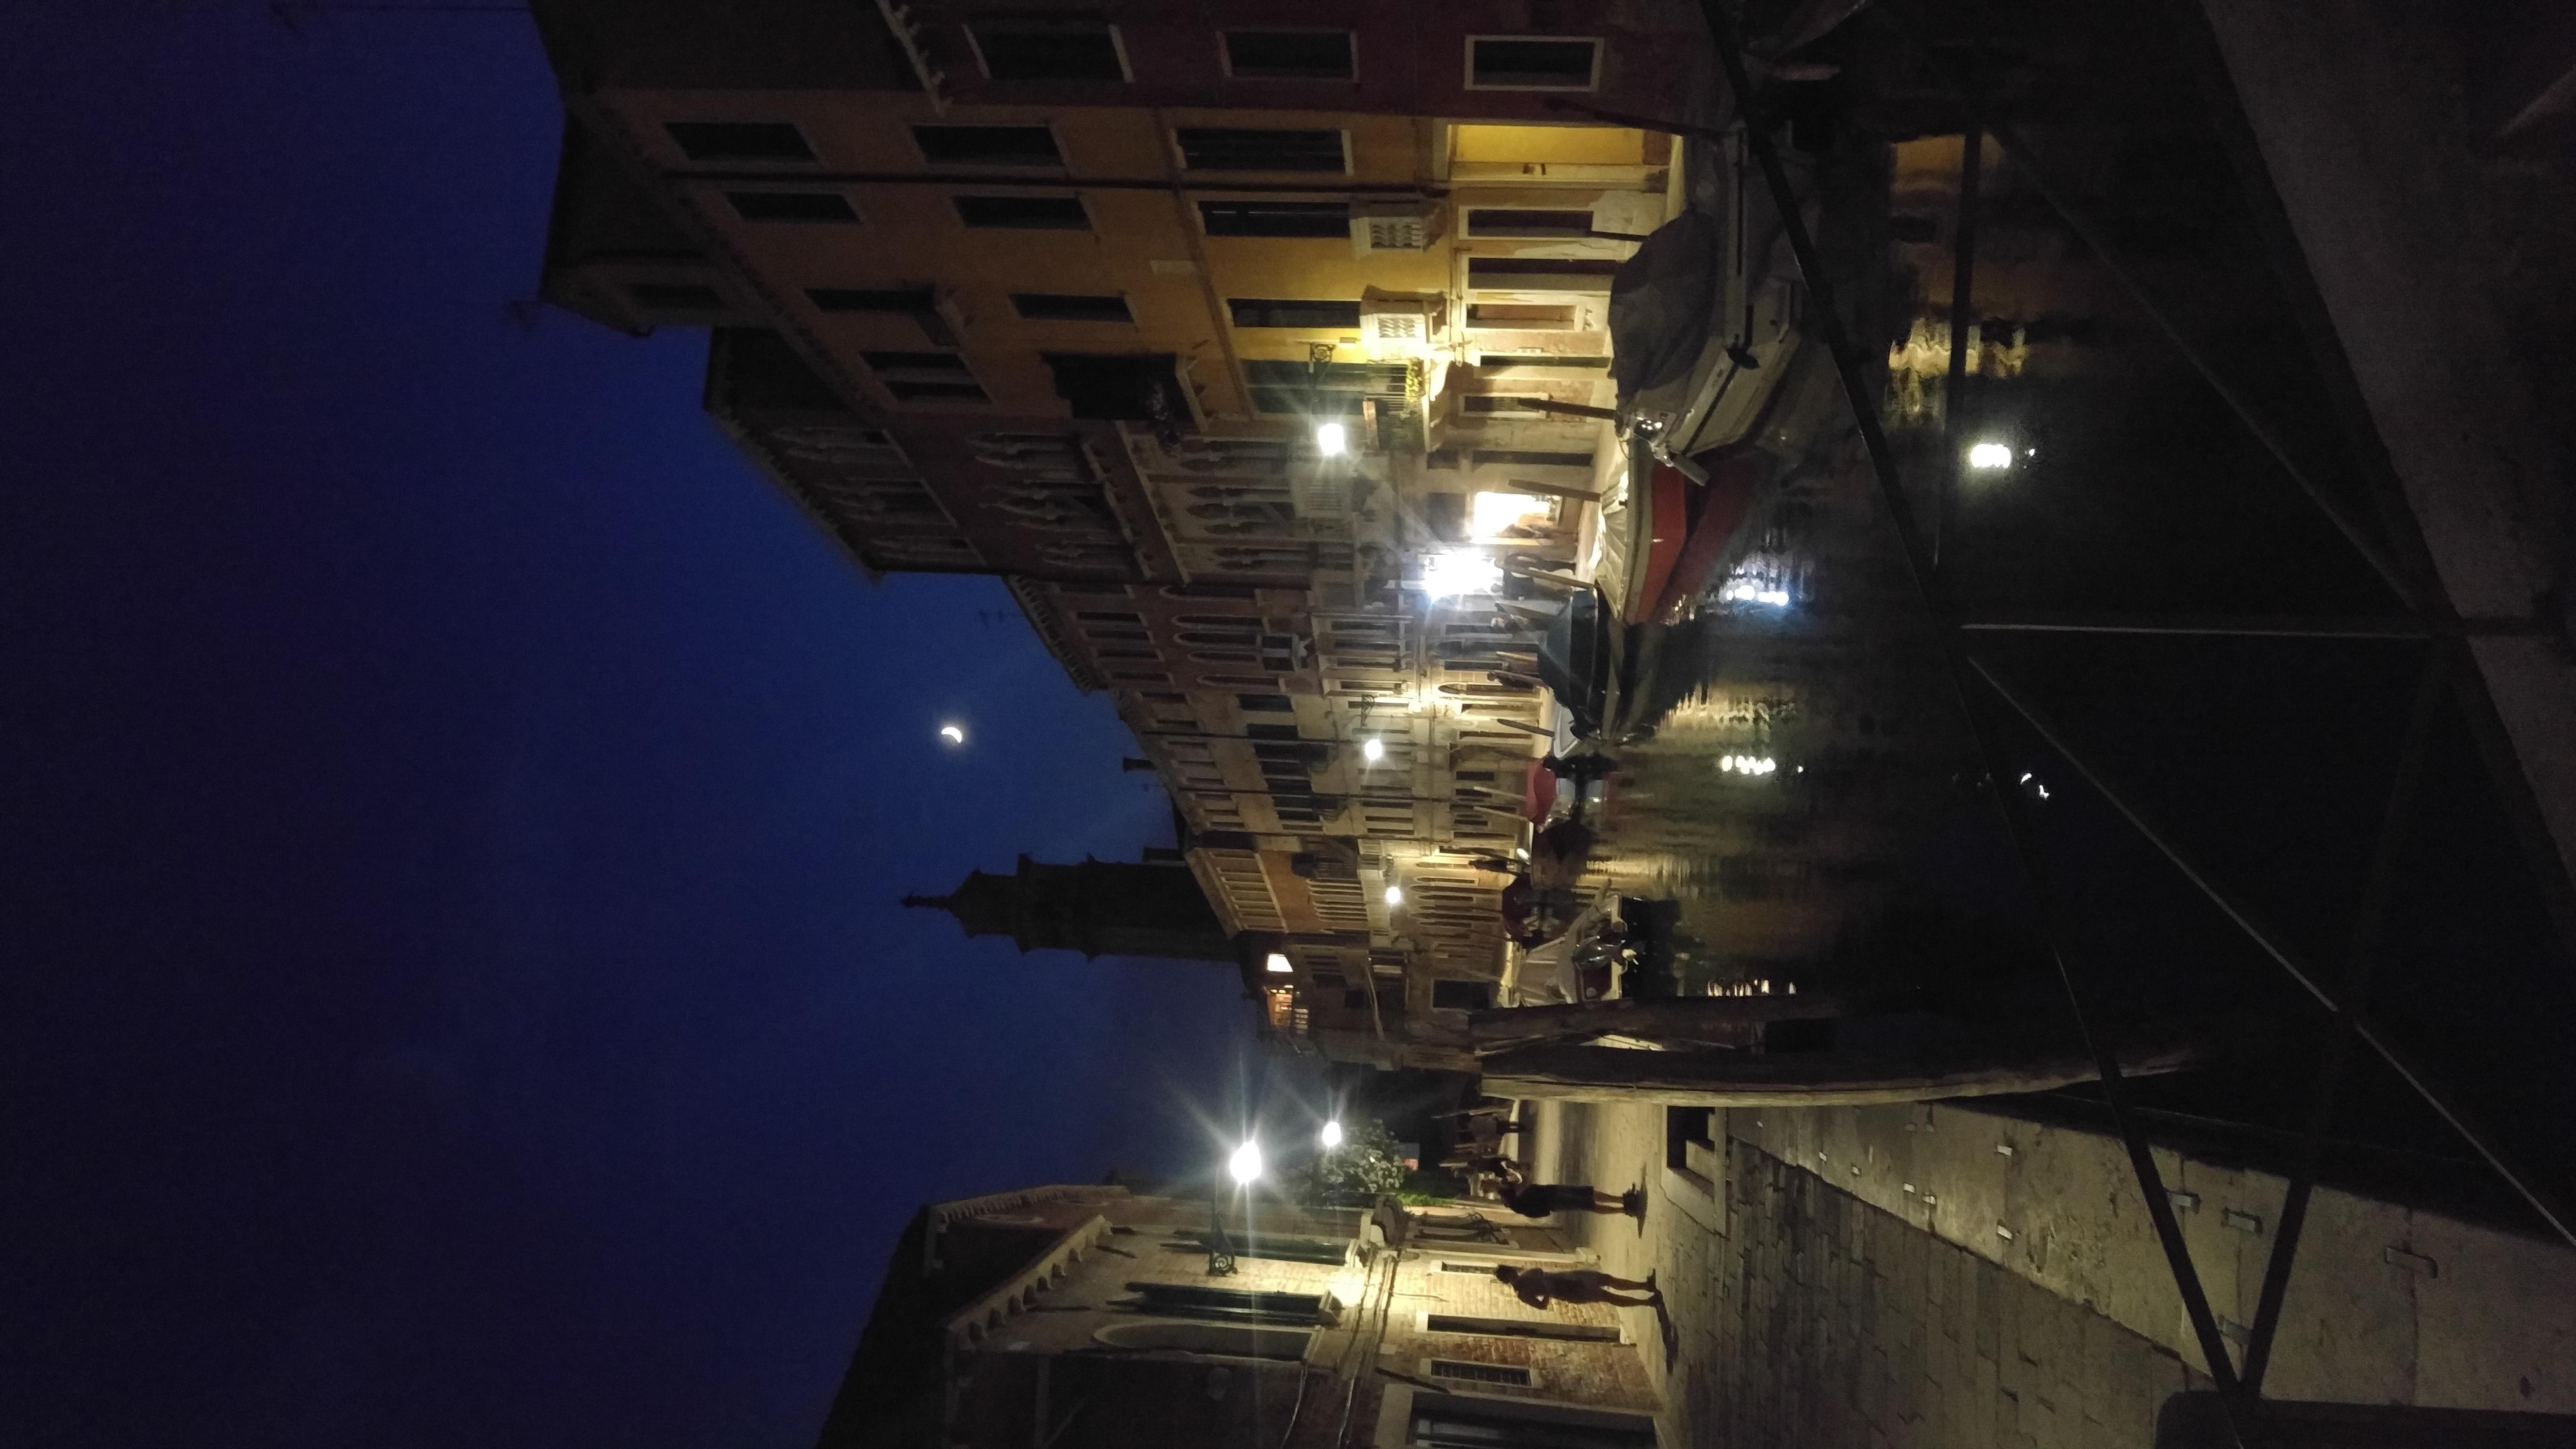 Tour gratis en español en Venecia